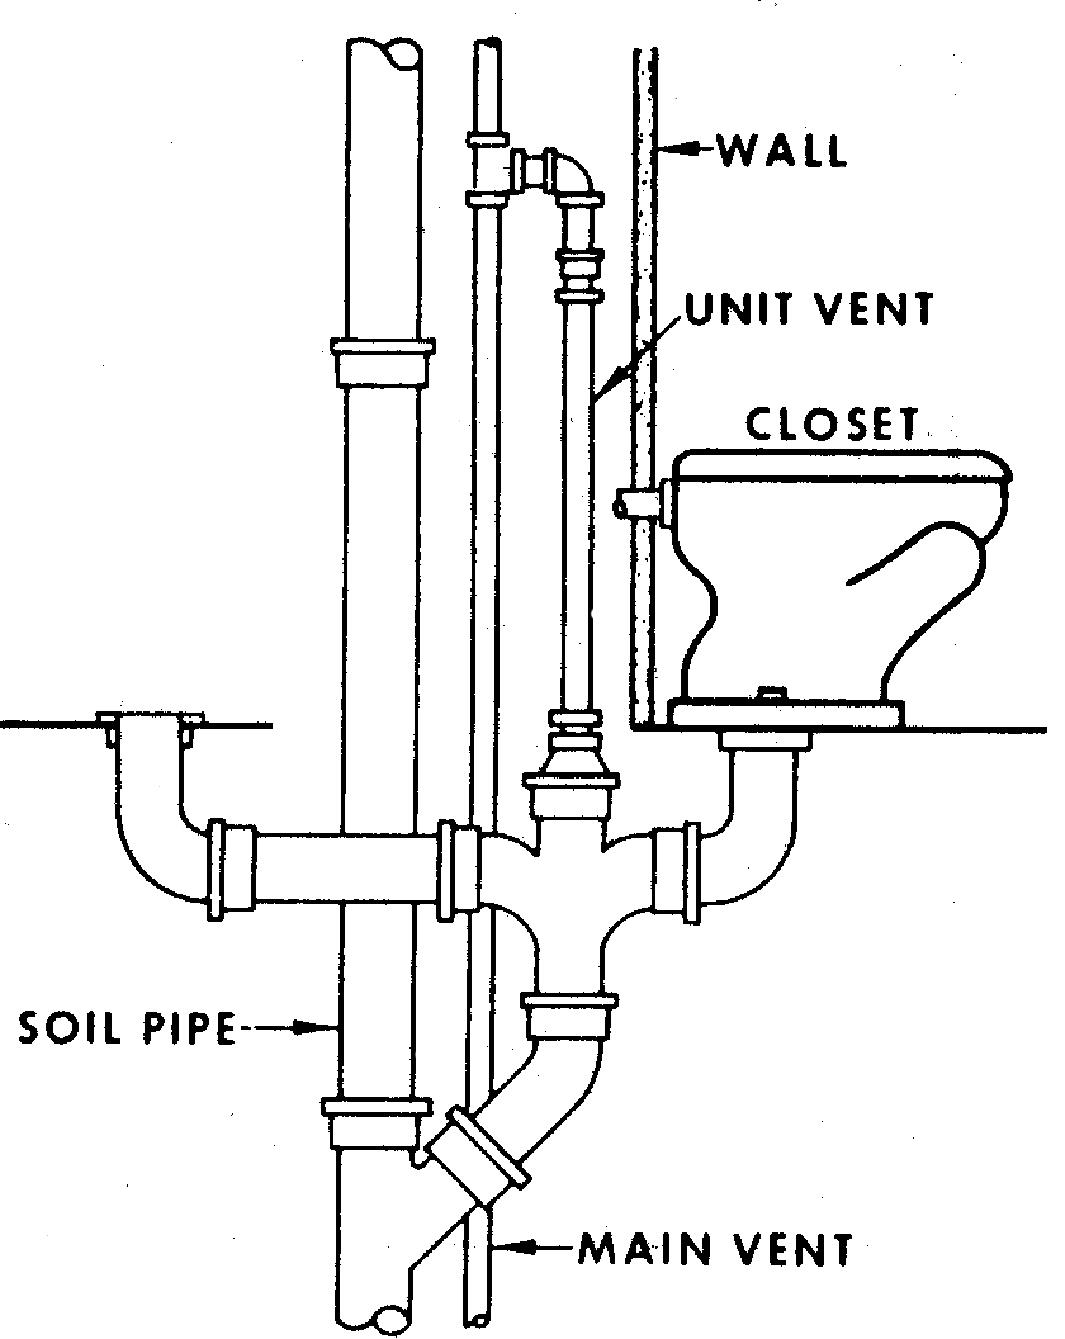 Water Closet Inspection